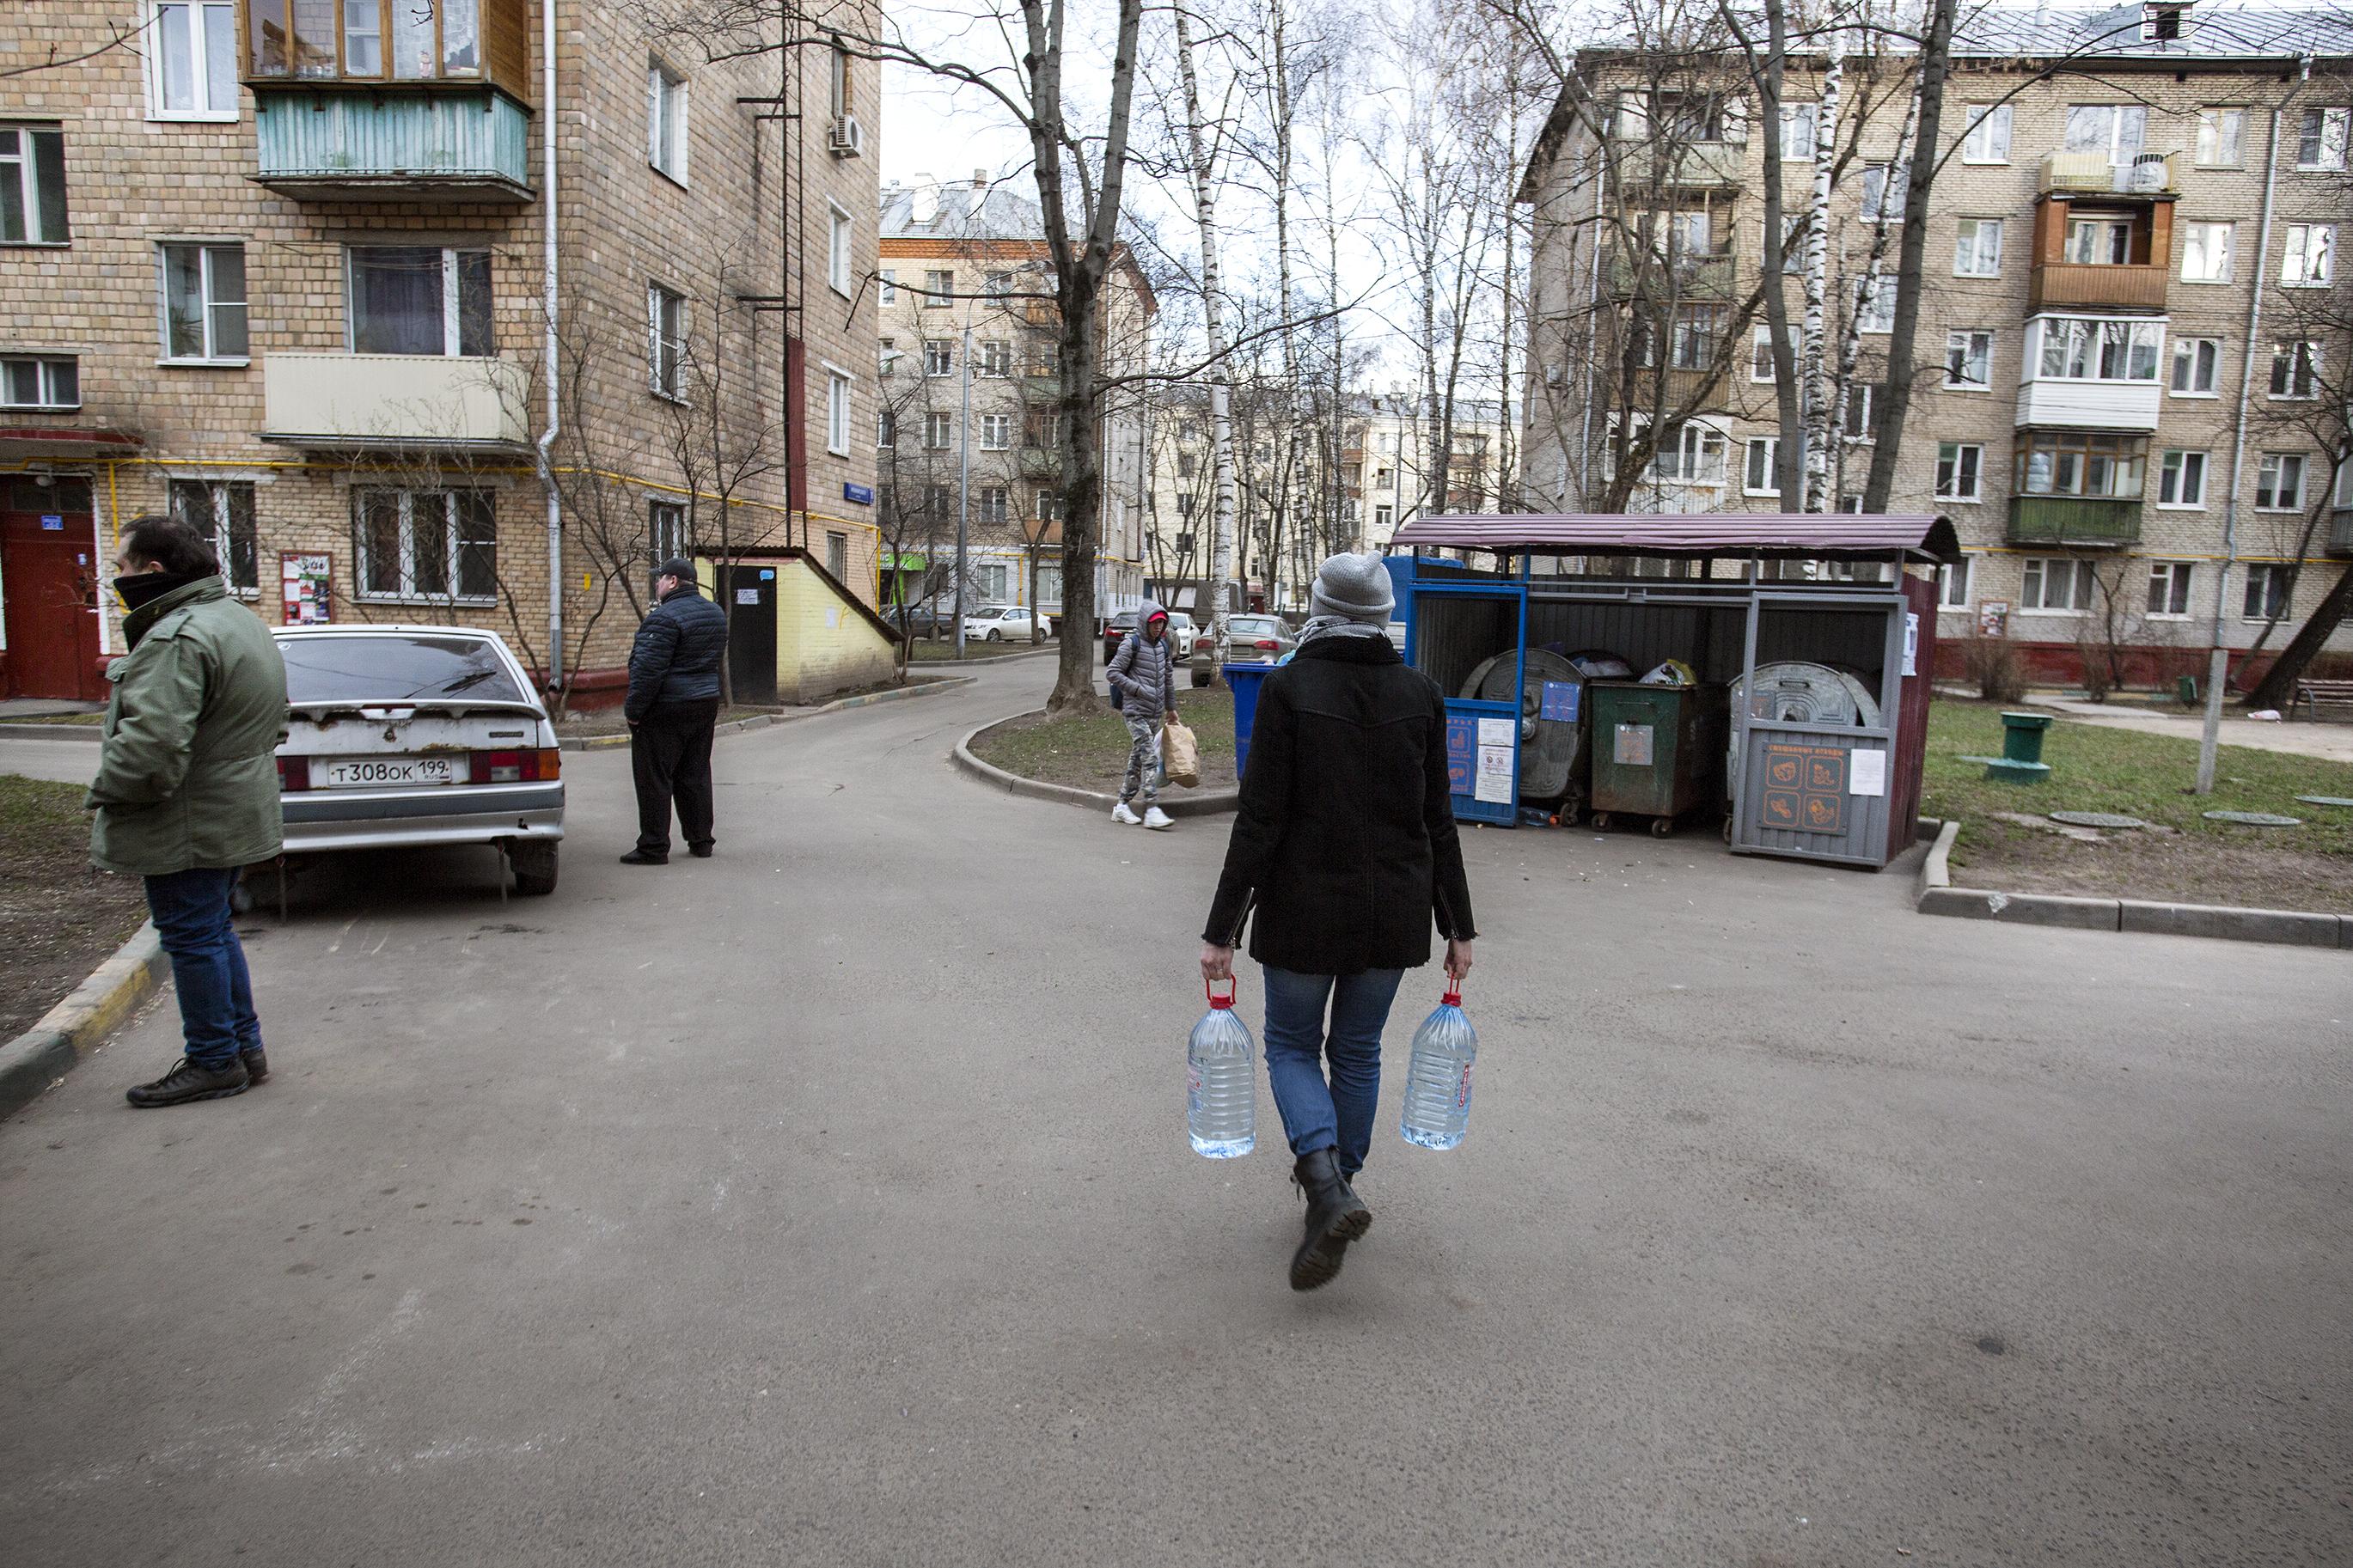 Journal de la quarantaine, 22 mars 2020, Jour 4 © Kseniya Yablonskaya